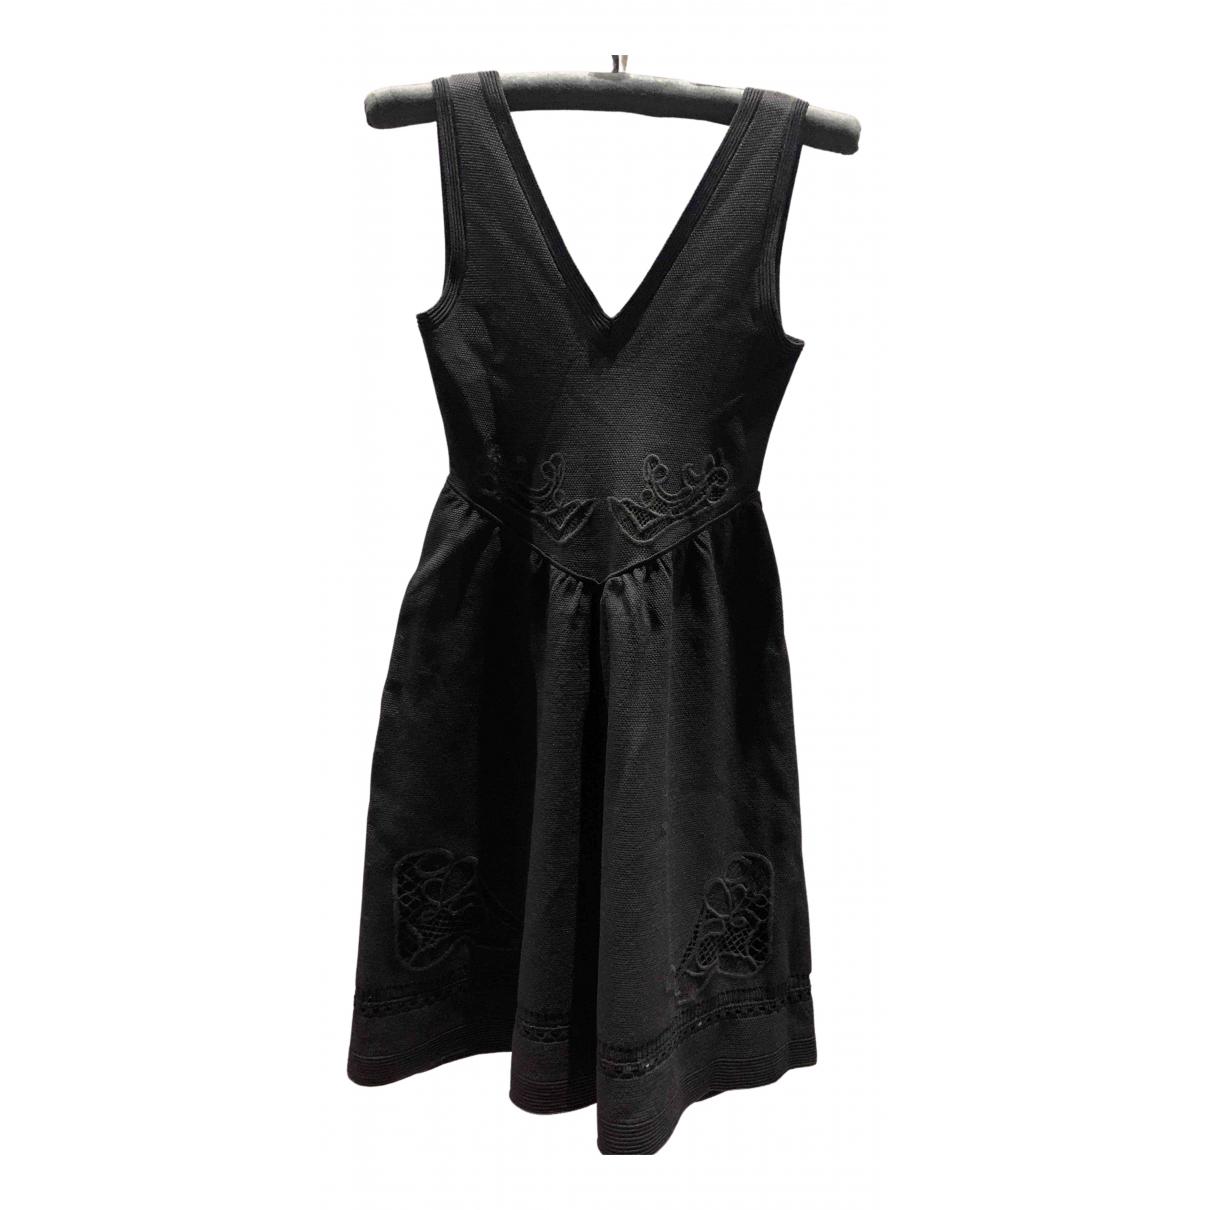 Maje N Black dress for Women 38 FR